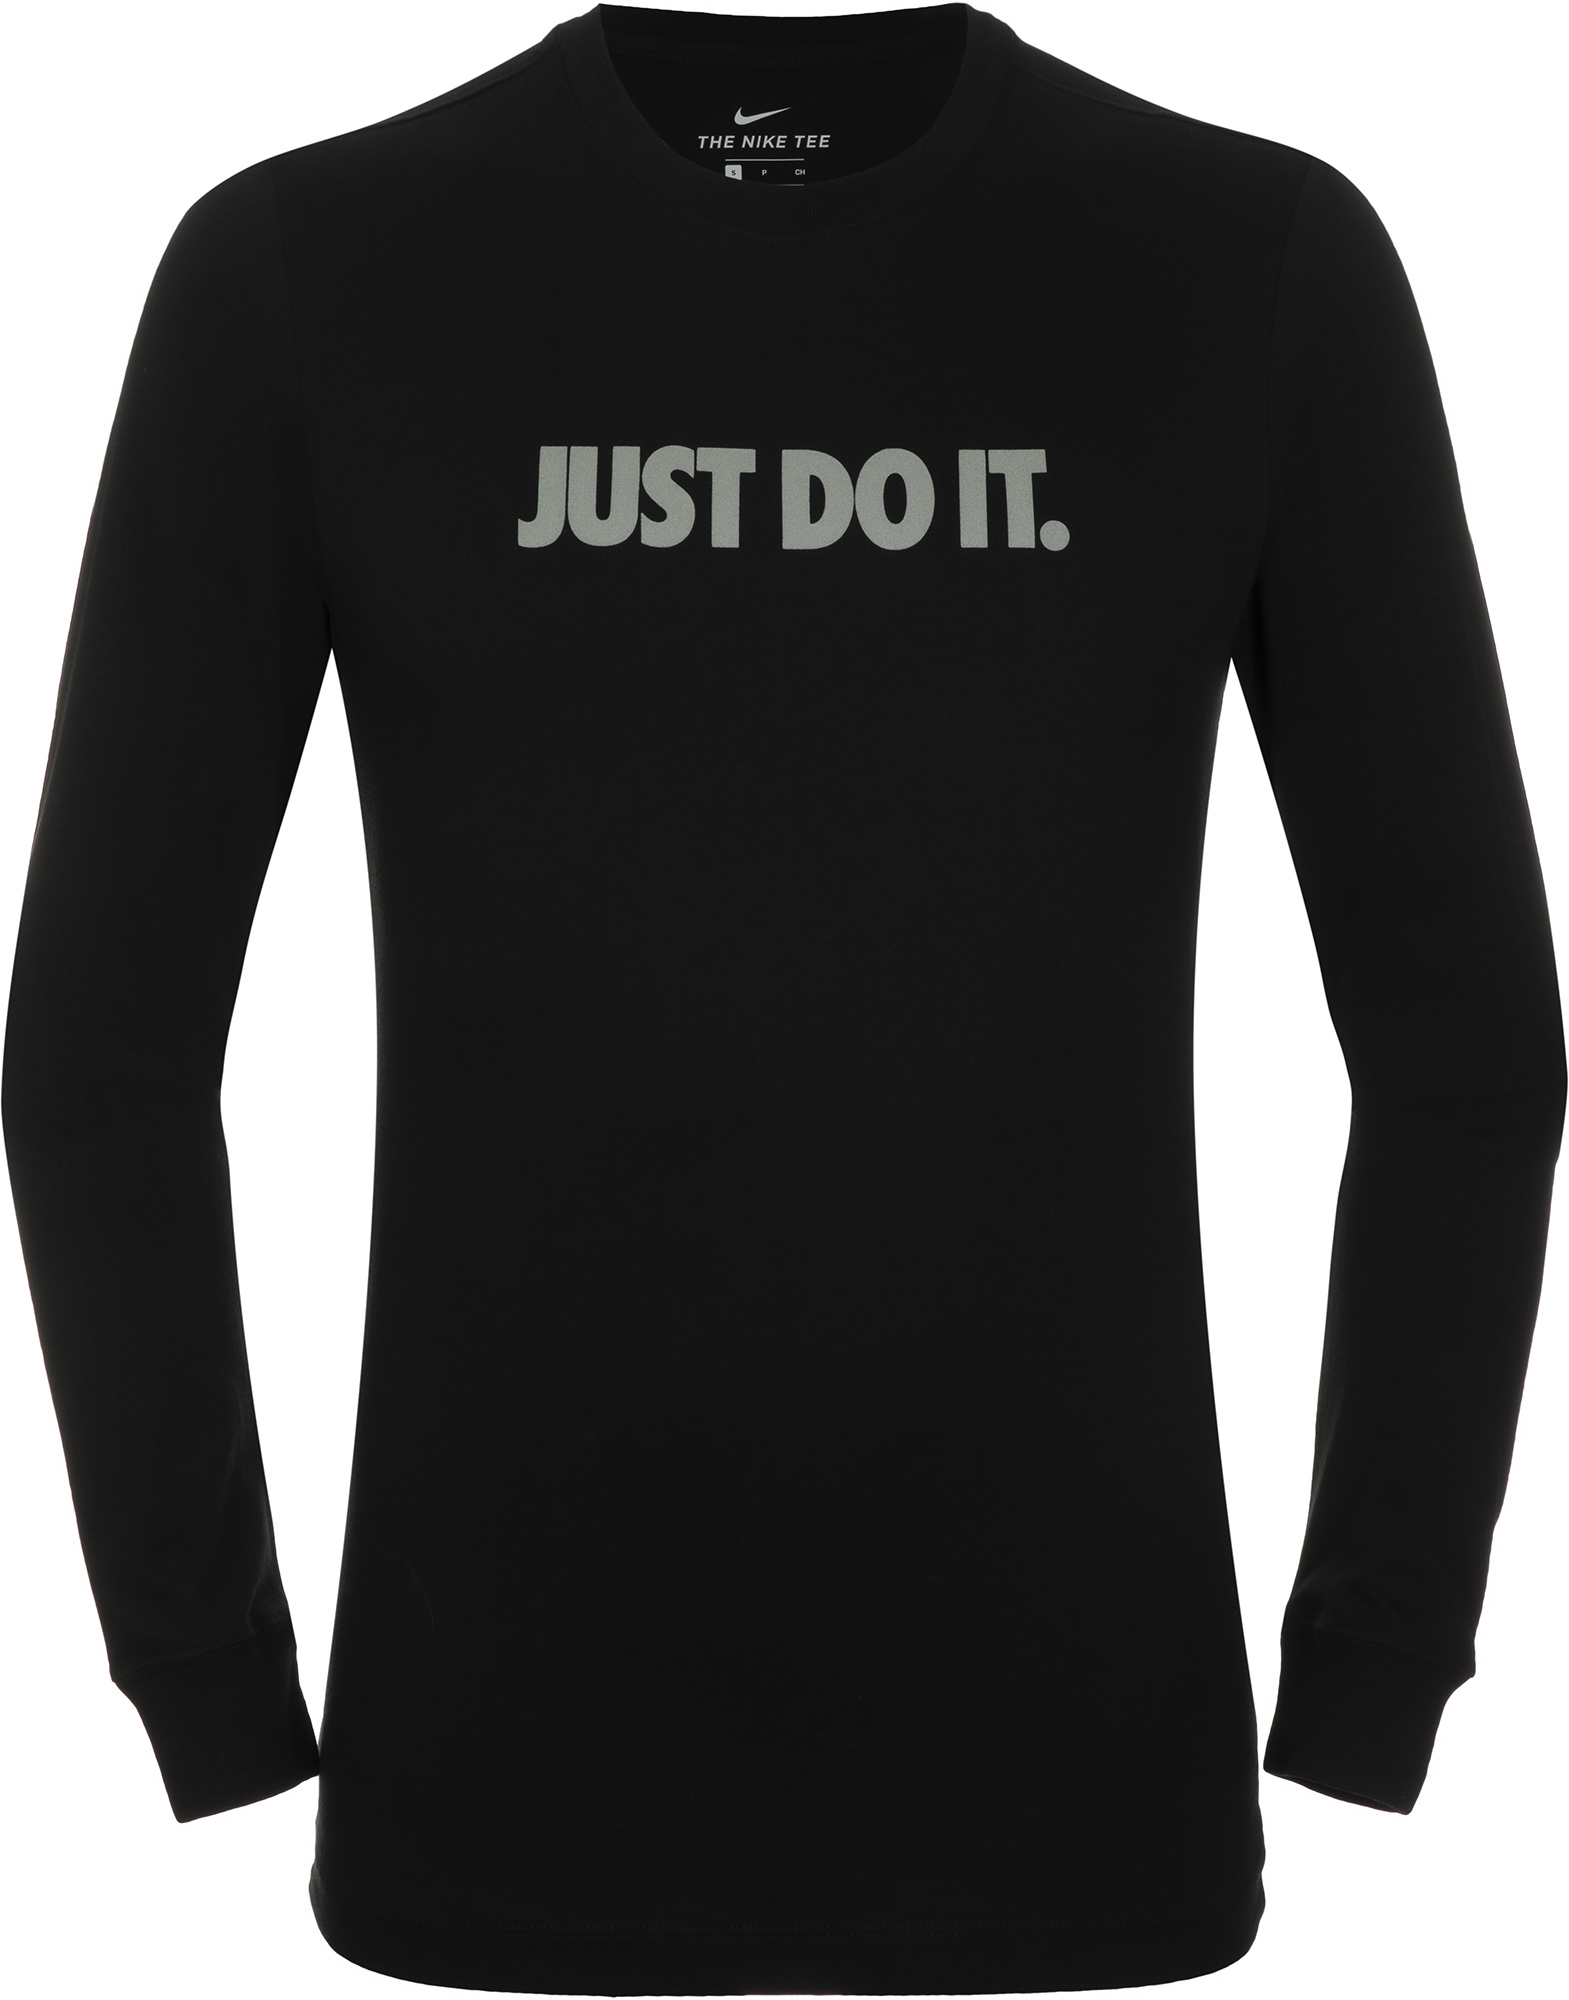 Фото - Nike Лонгслив мужской Nike Sportswear Just Do It, размер 50-52 nike свитшот мужской nike sportswear just do it размер 52 54